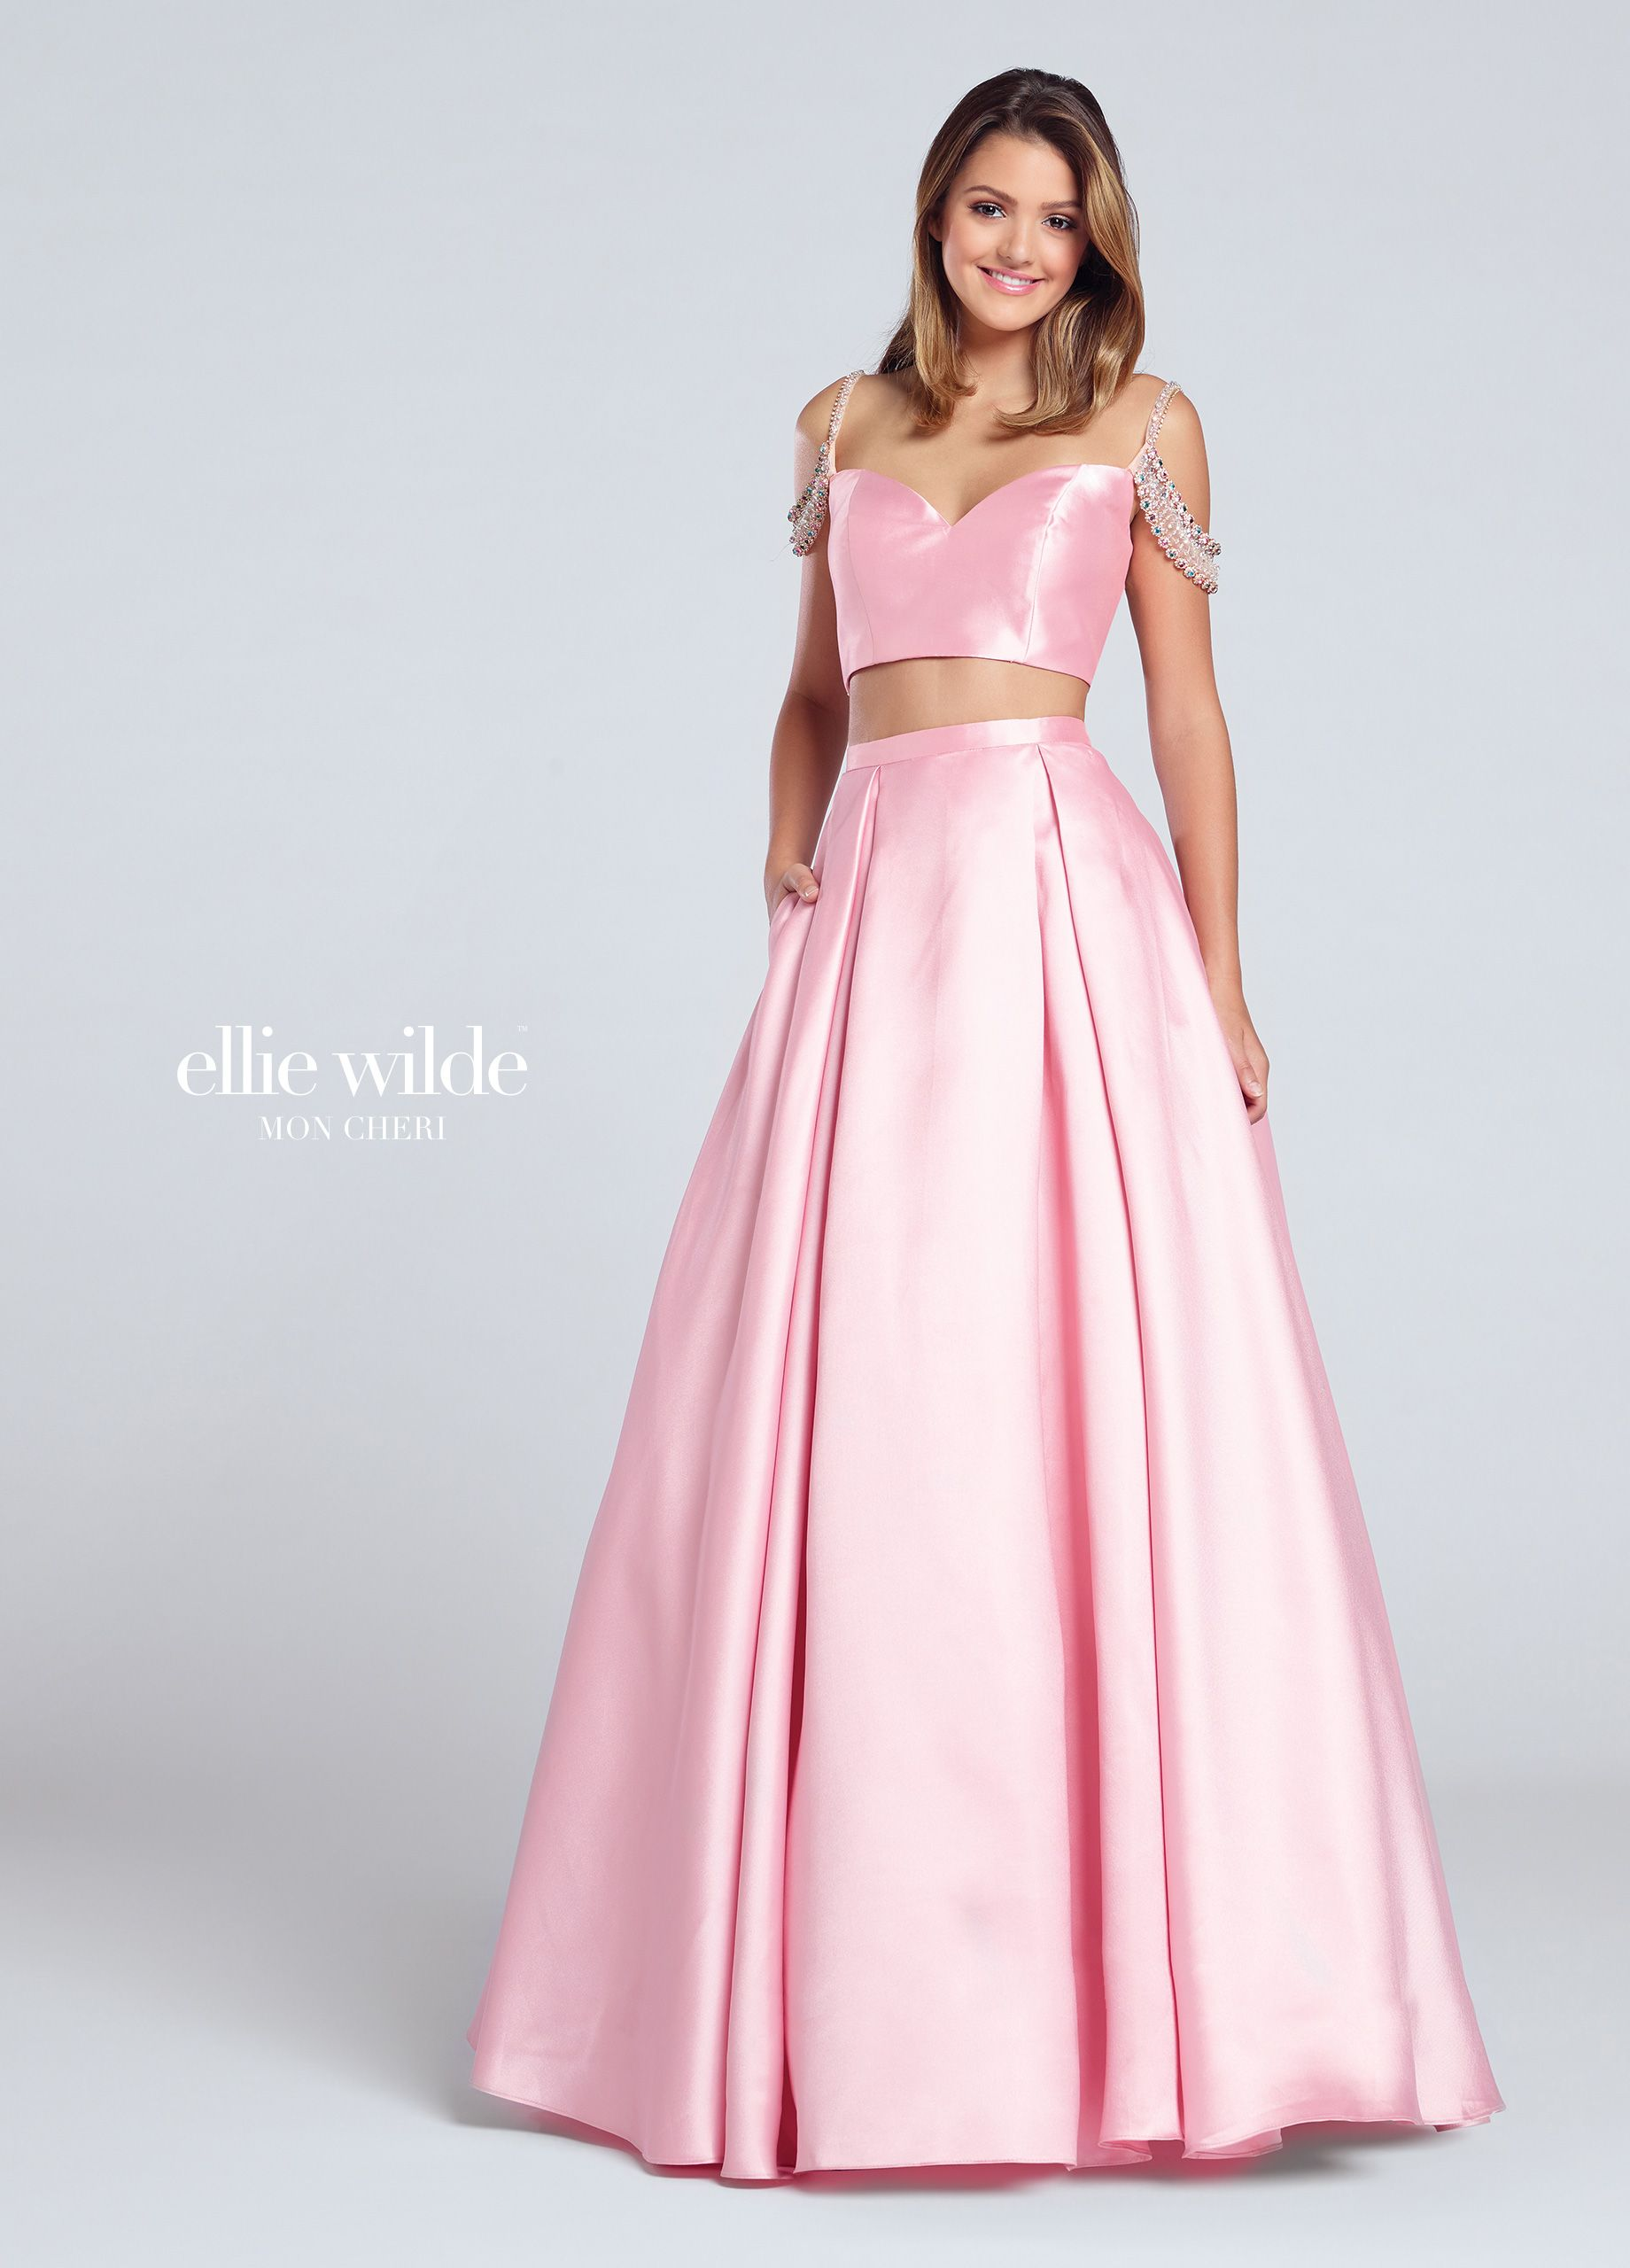 Pin de Jess en Prom dresses | Pinterest